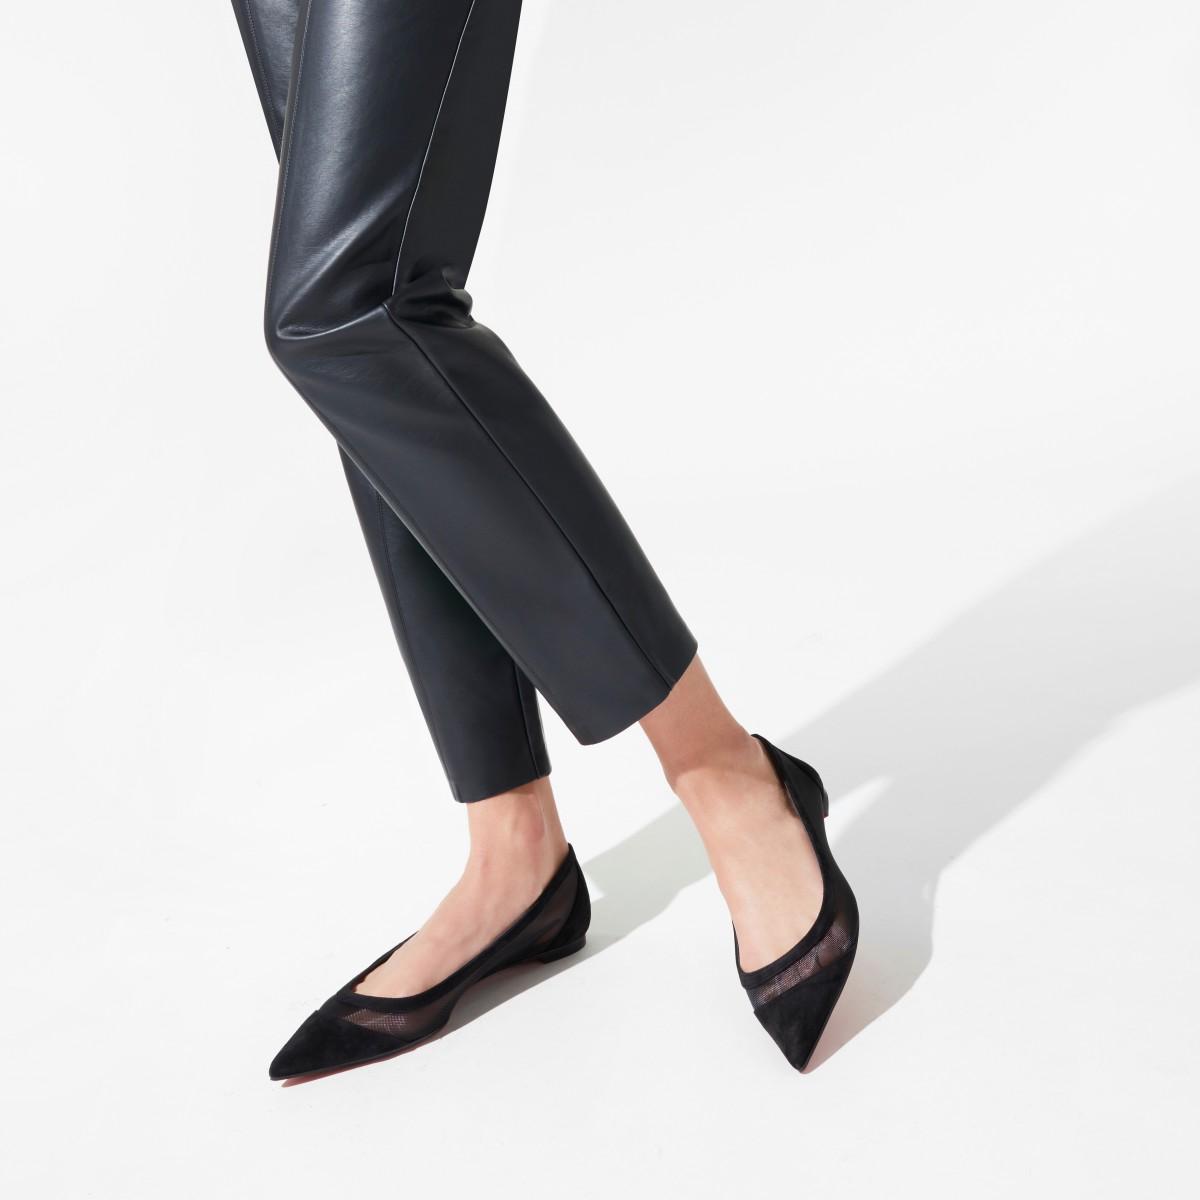 Shoes - Galativi Flat - Christian Louboutin